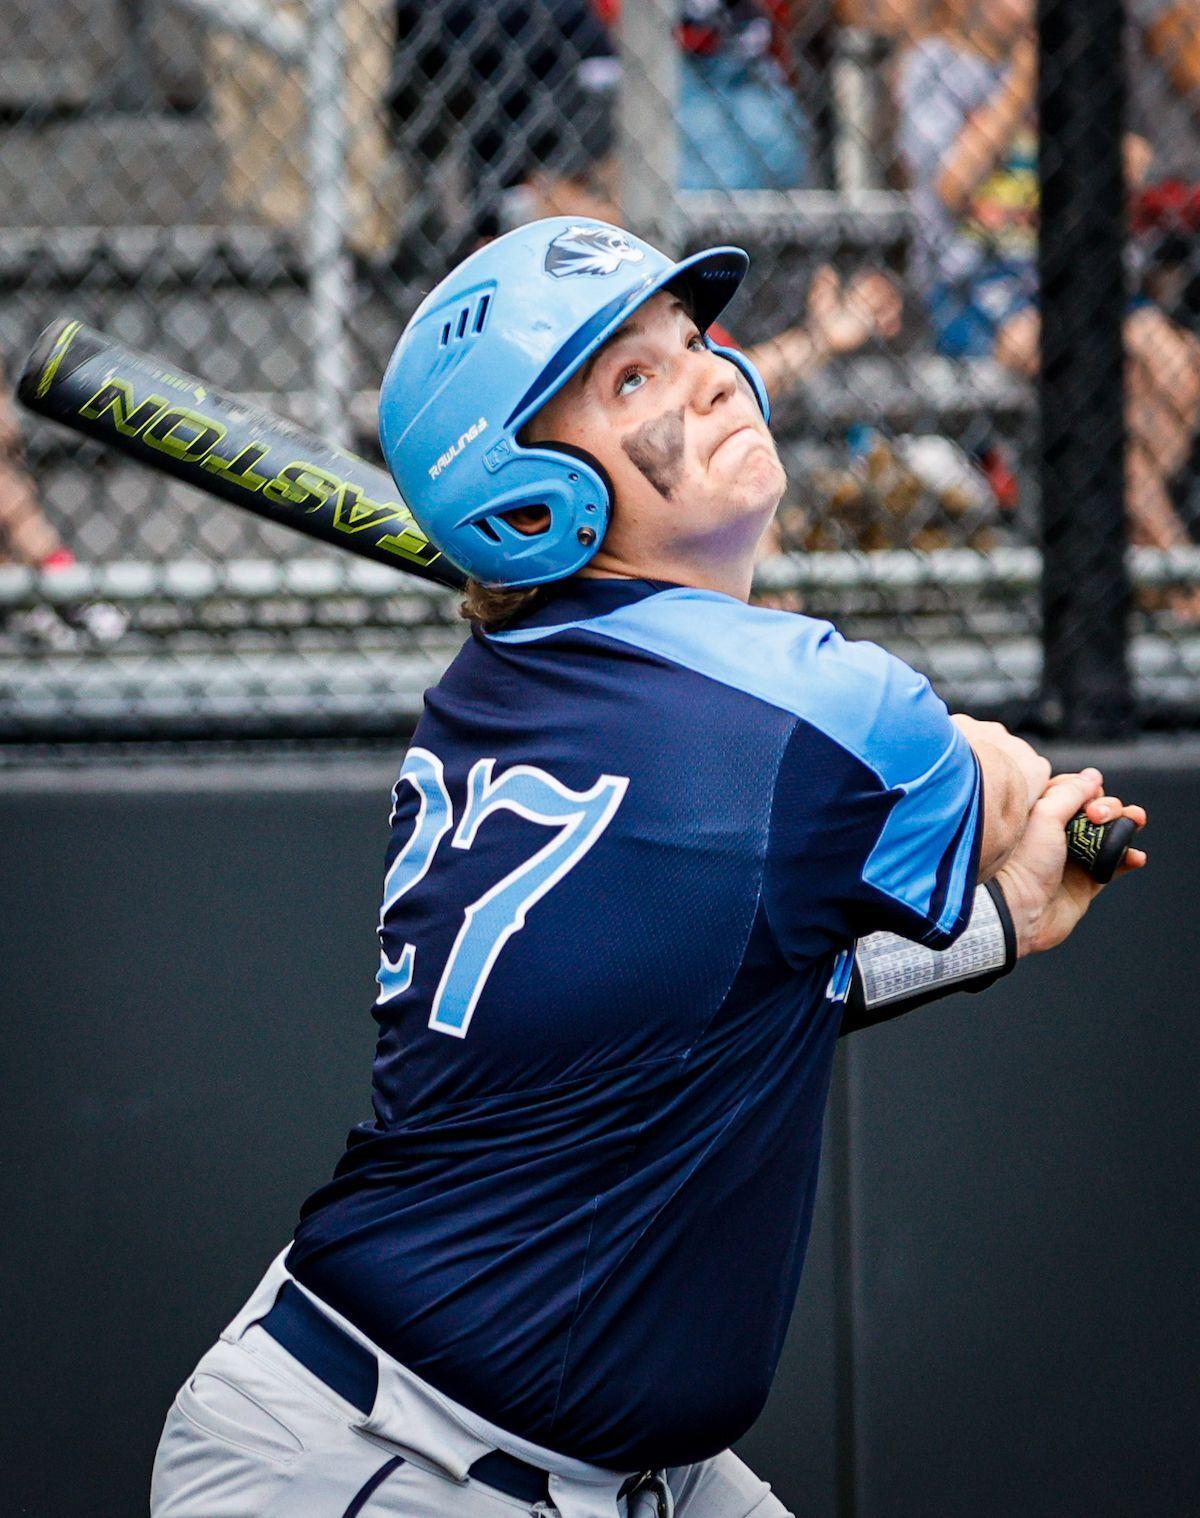 salem baseball may 20 wethy